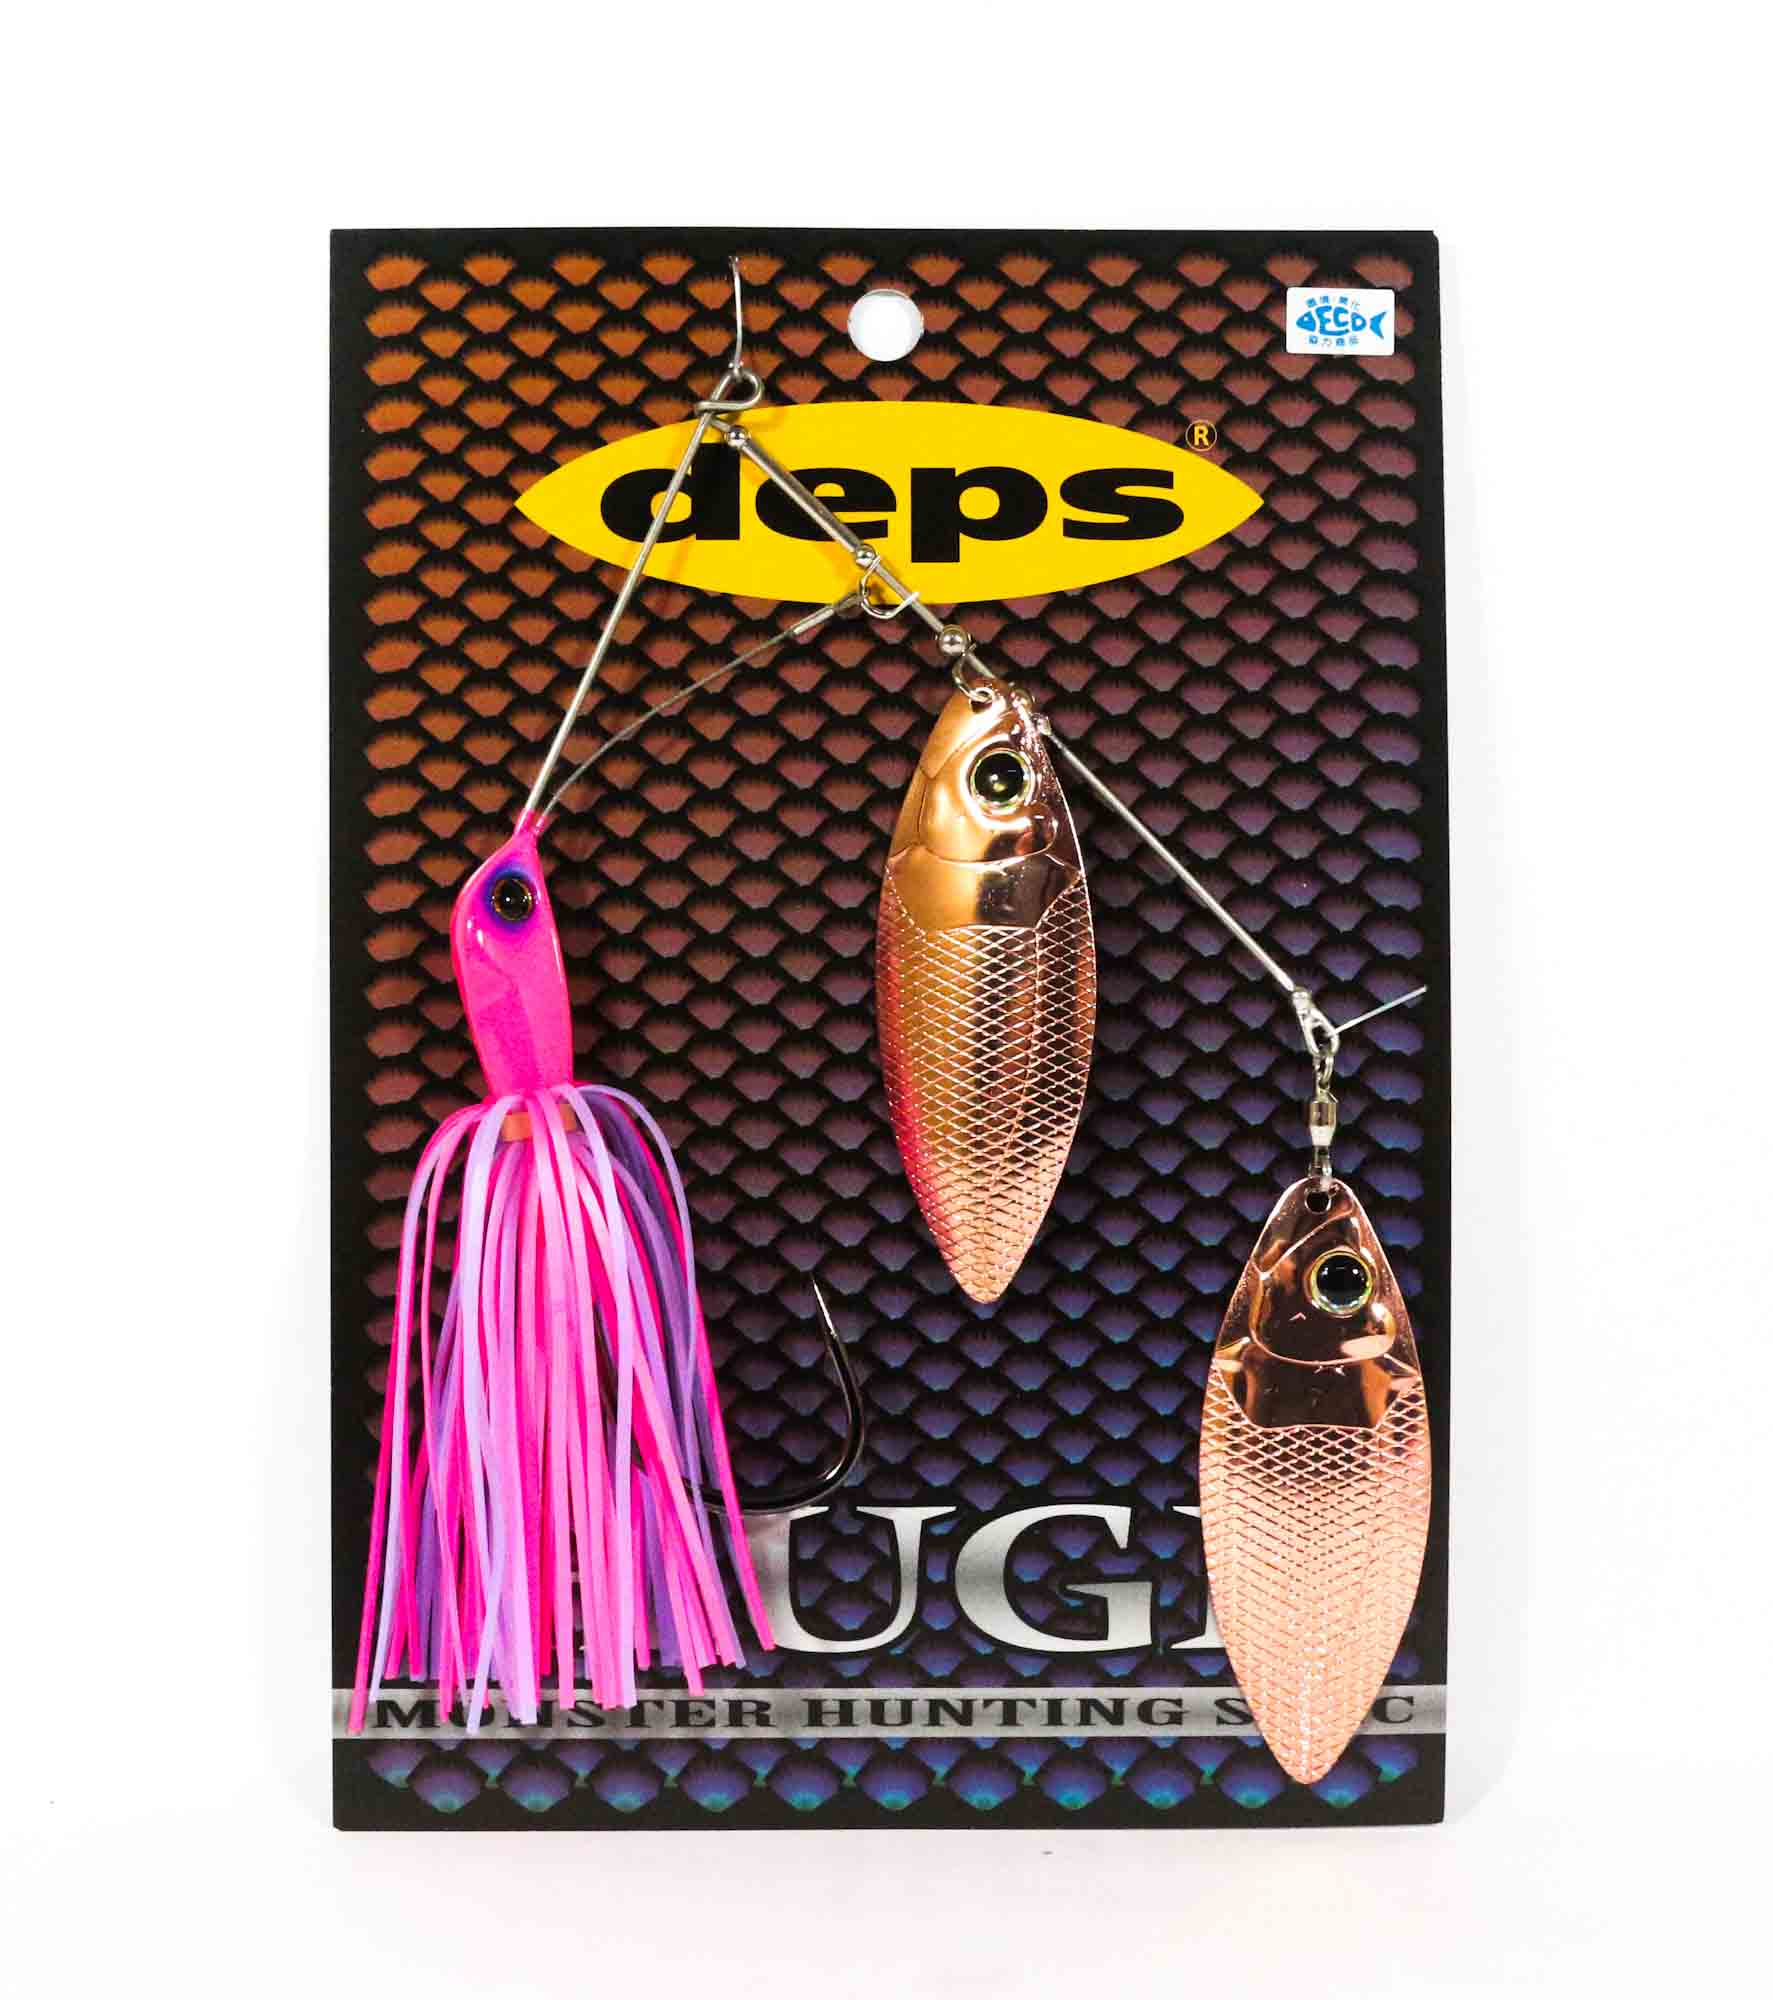 Deps Huge Custom Spinnerbait Monster Hunting 1 oz Hook Size 9/0 03 (0036)